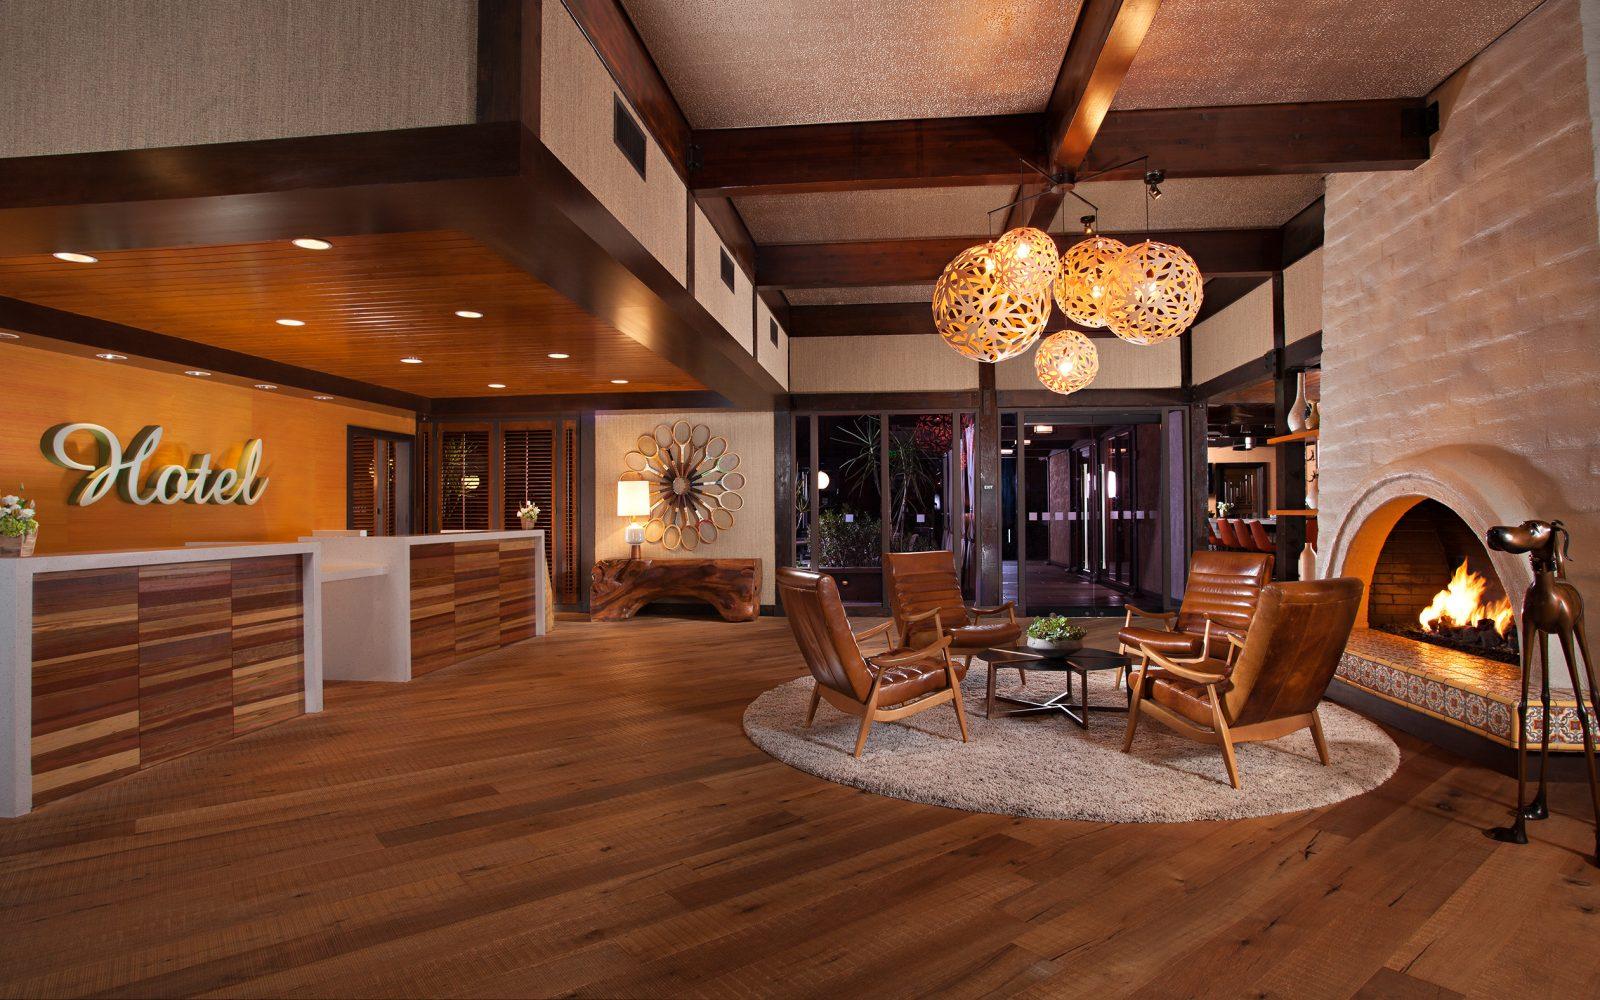 Hotels Near Universal Studios >> Hotels near Universal Studios | Hollywood Hotels | The Garland